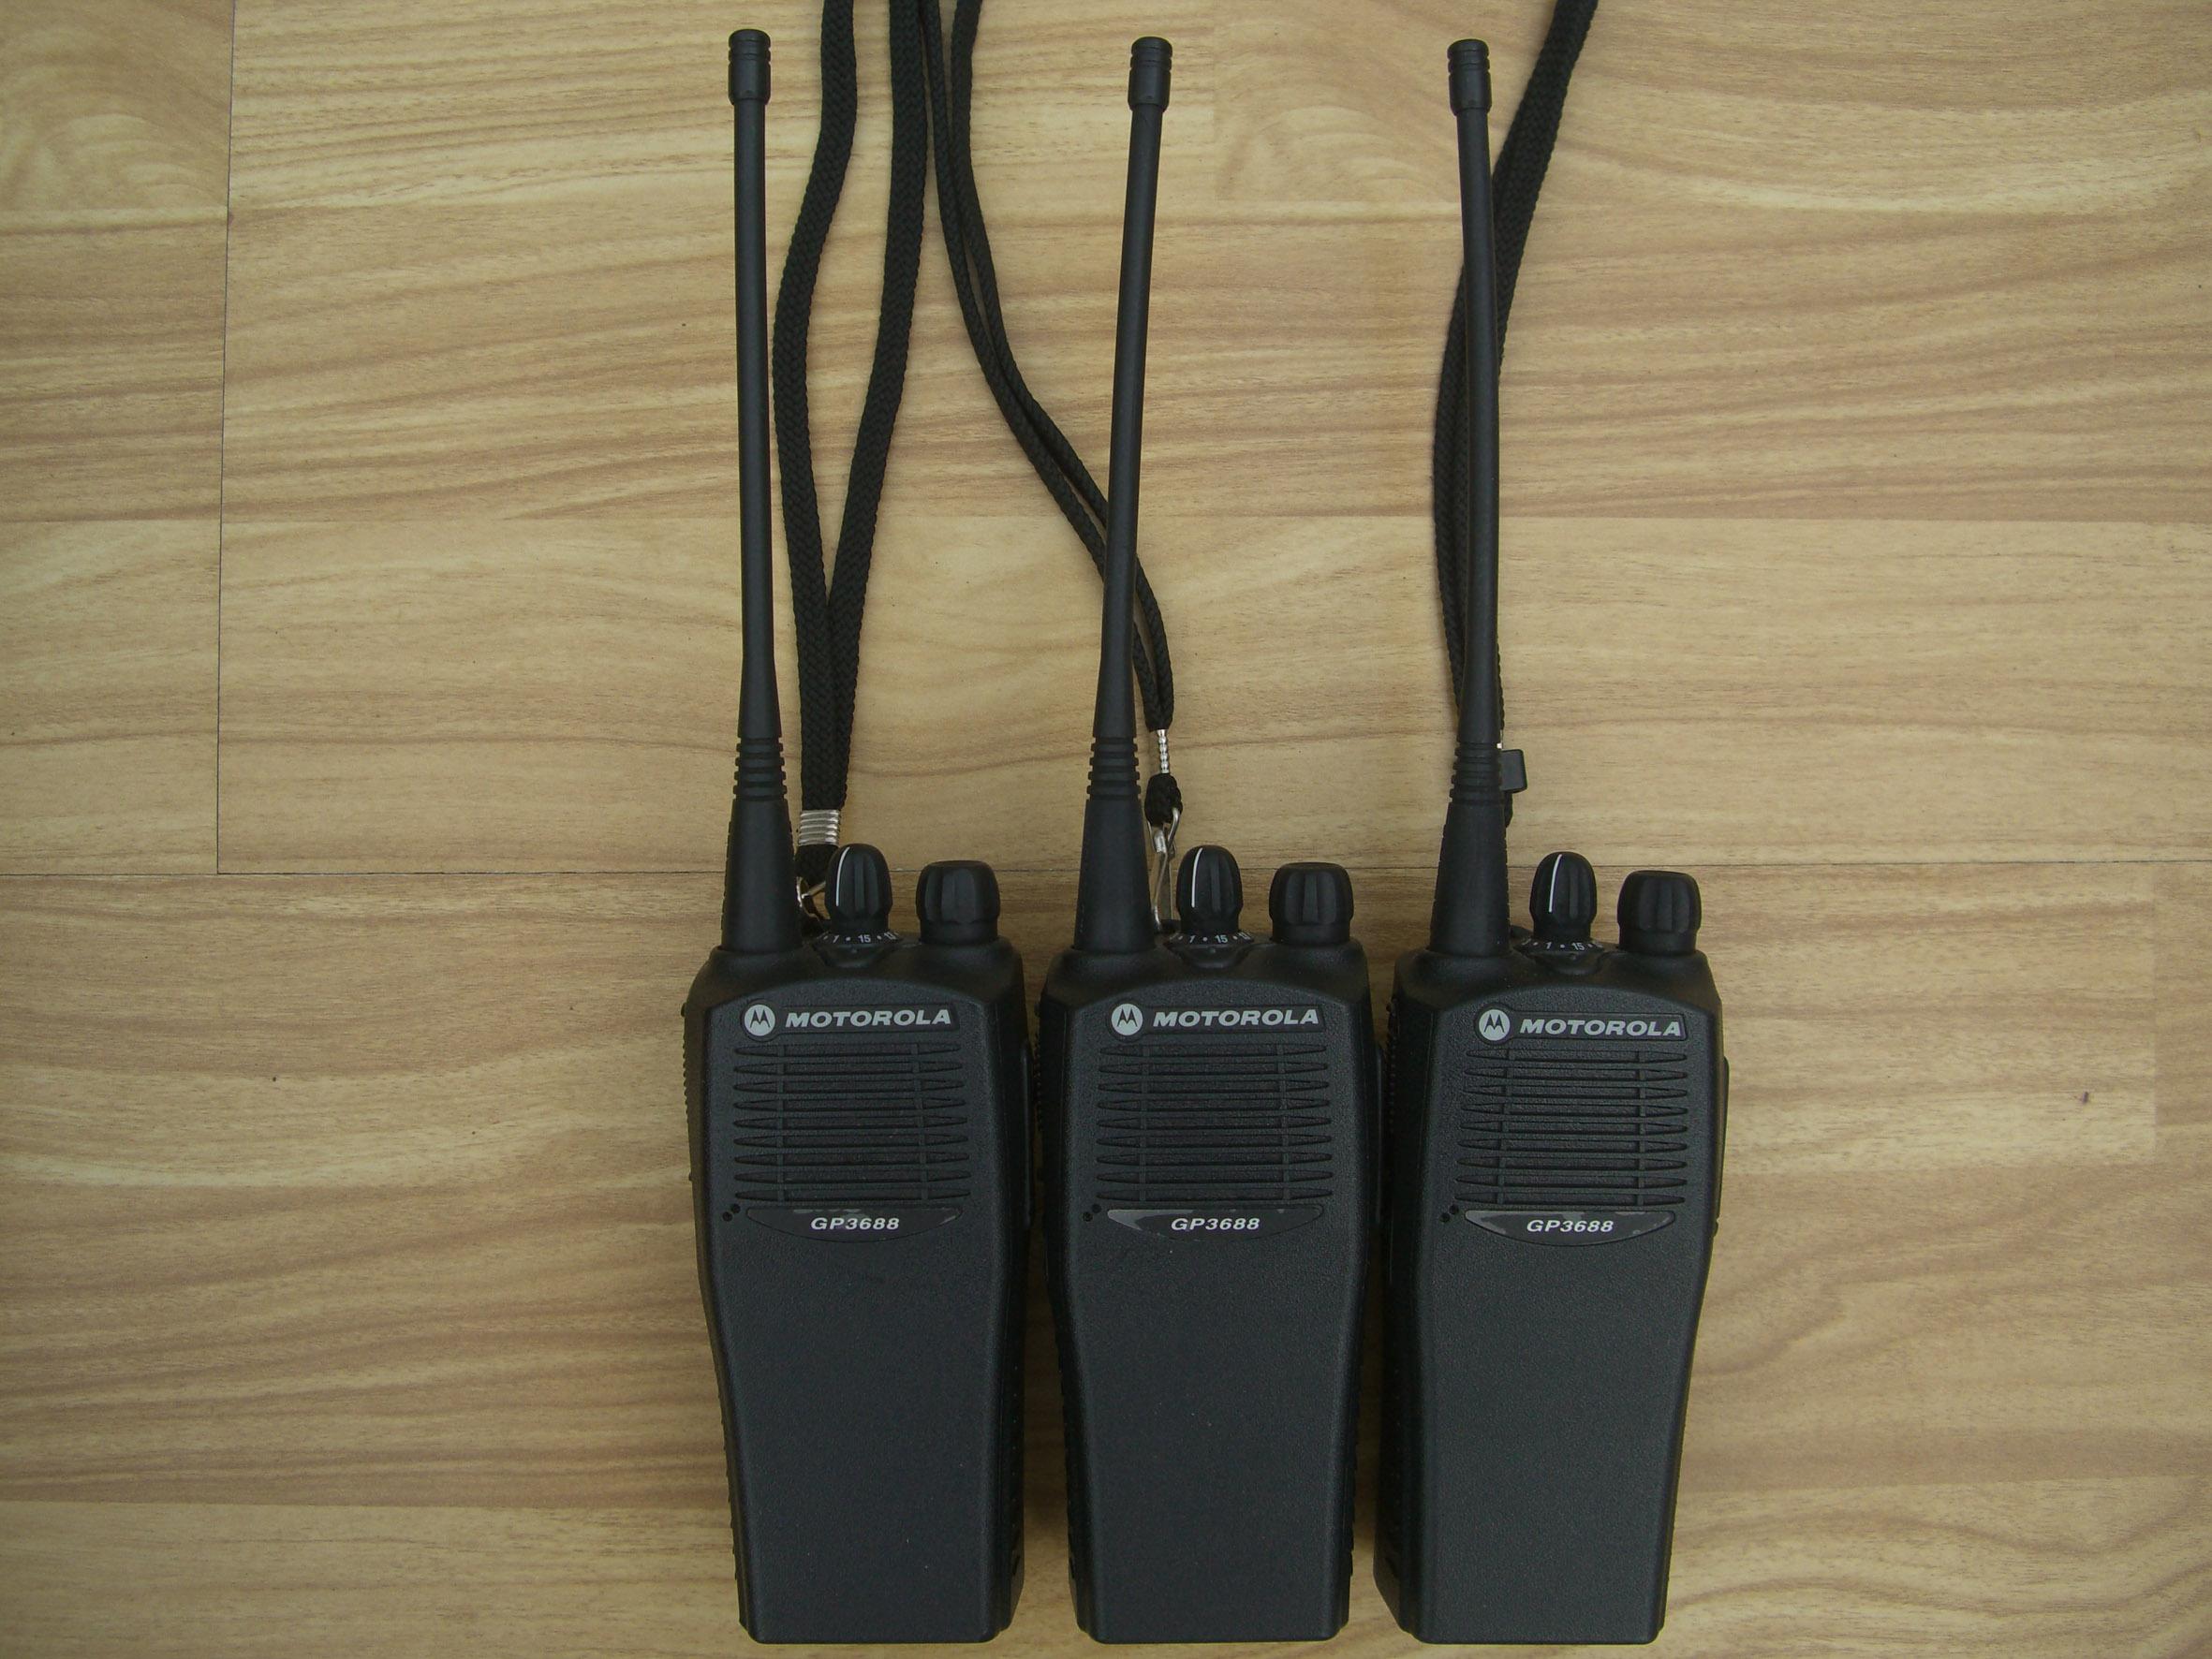 Bộ đàm cầm tay Motorola GP 3688